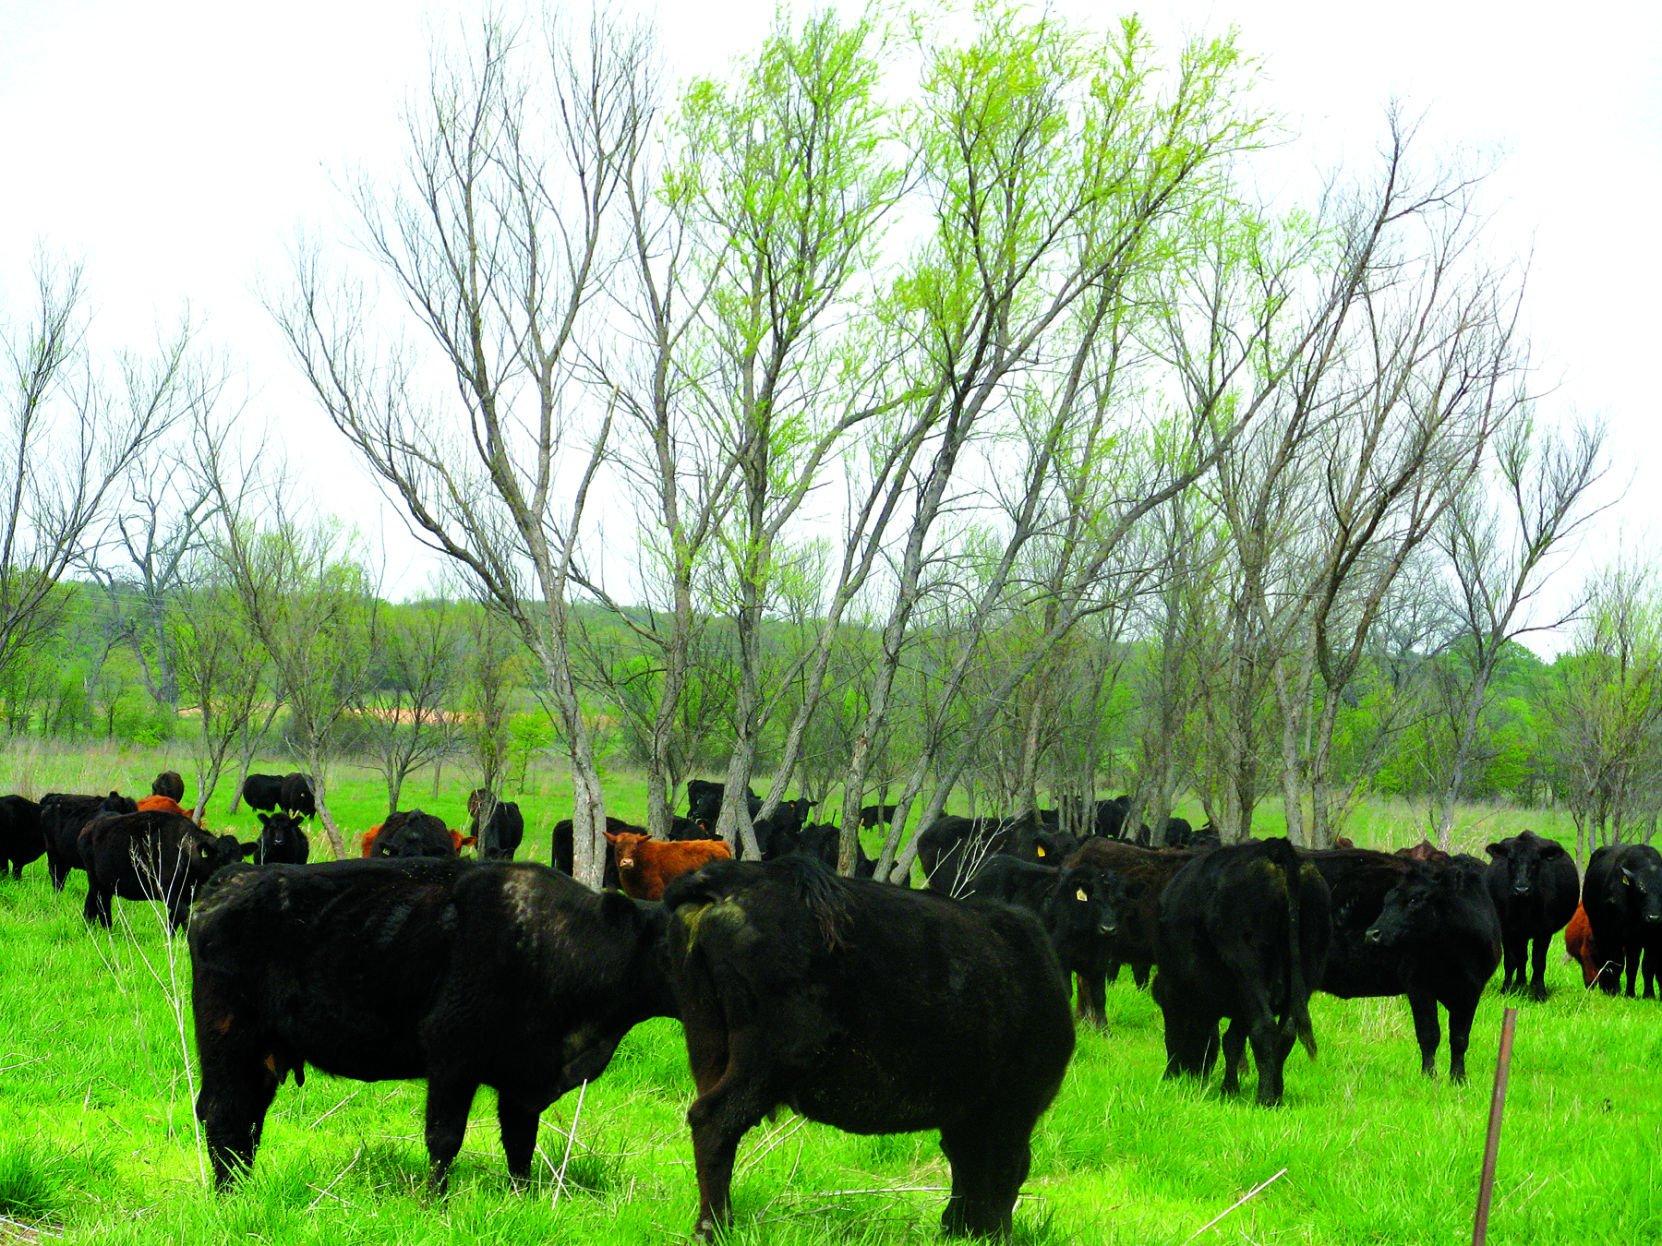 Preparing for the worst Good pasture management